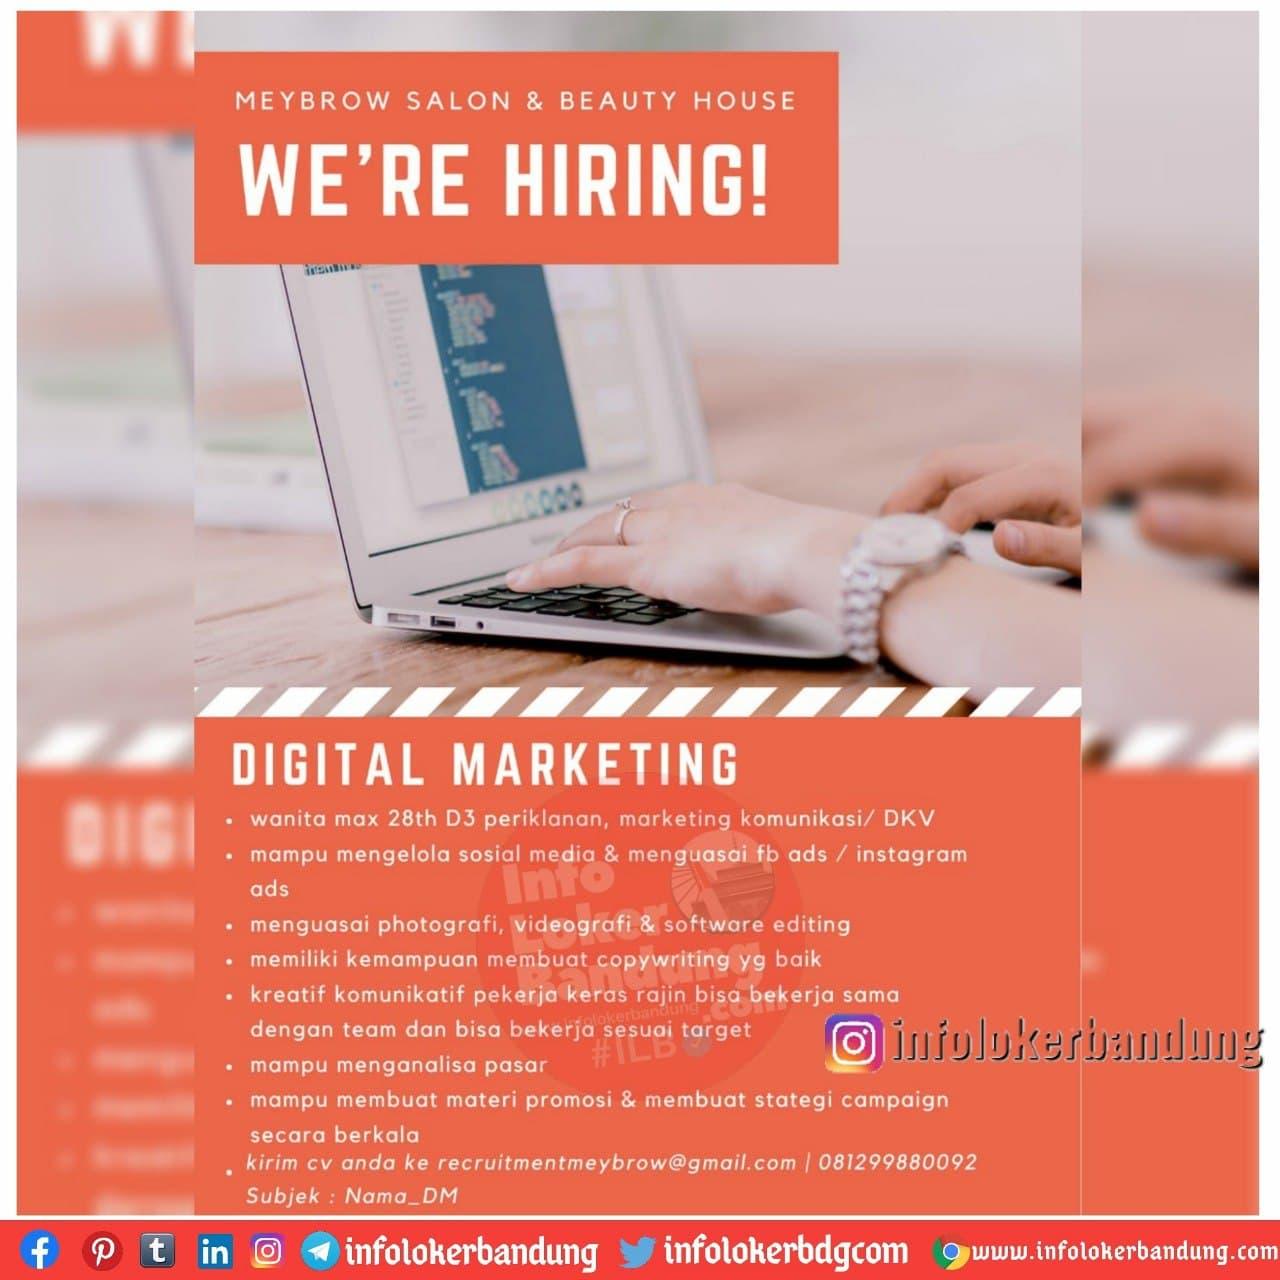 Lowongan Kerja Digital Marketing Meybrow Salon & Beauty House Bandung Desember 2020